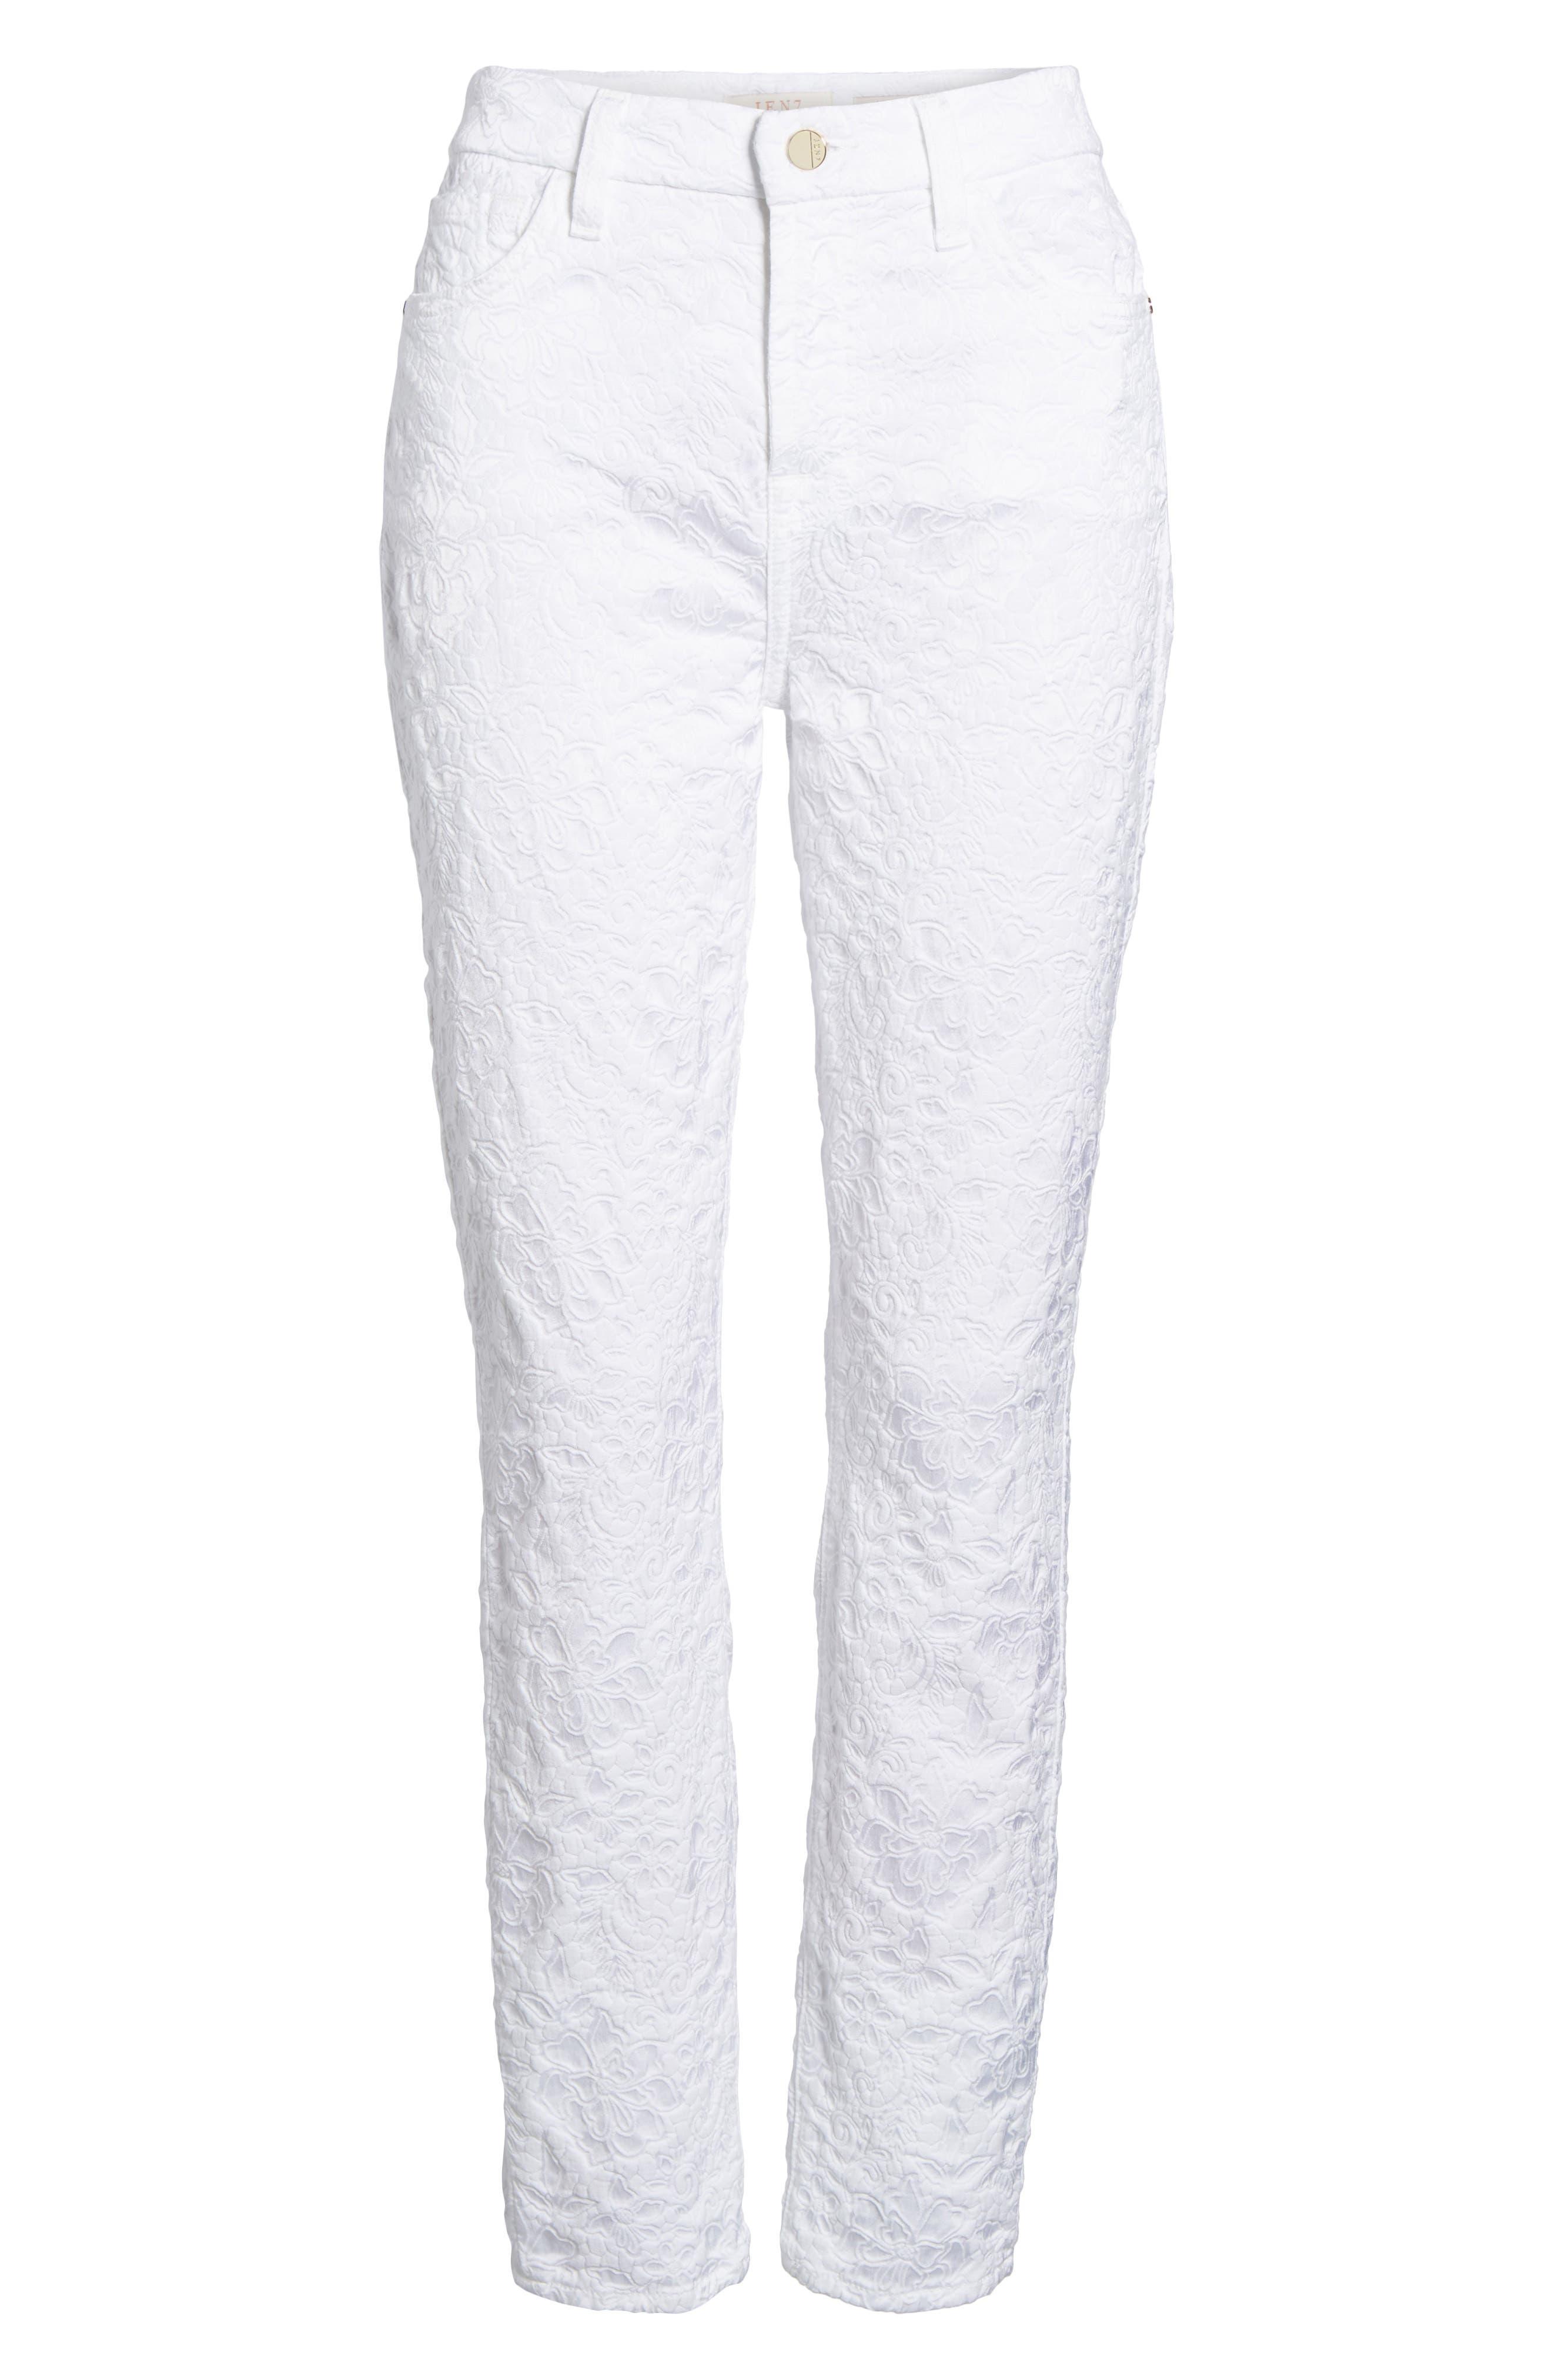 Jacquard Ankle Skinny Jeans,                             Alternate thumbnail 6, color,                             White